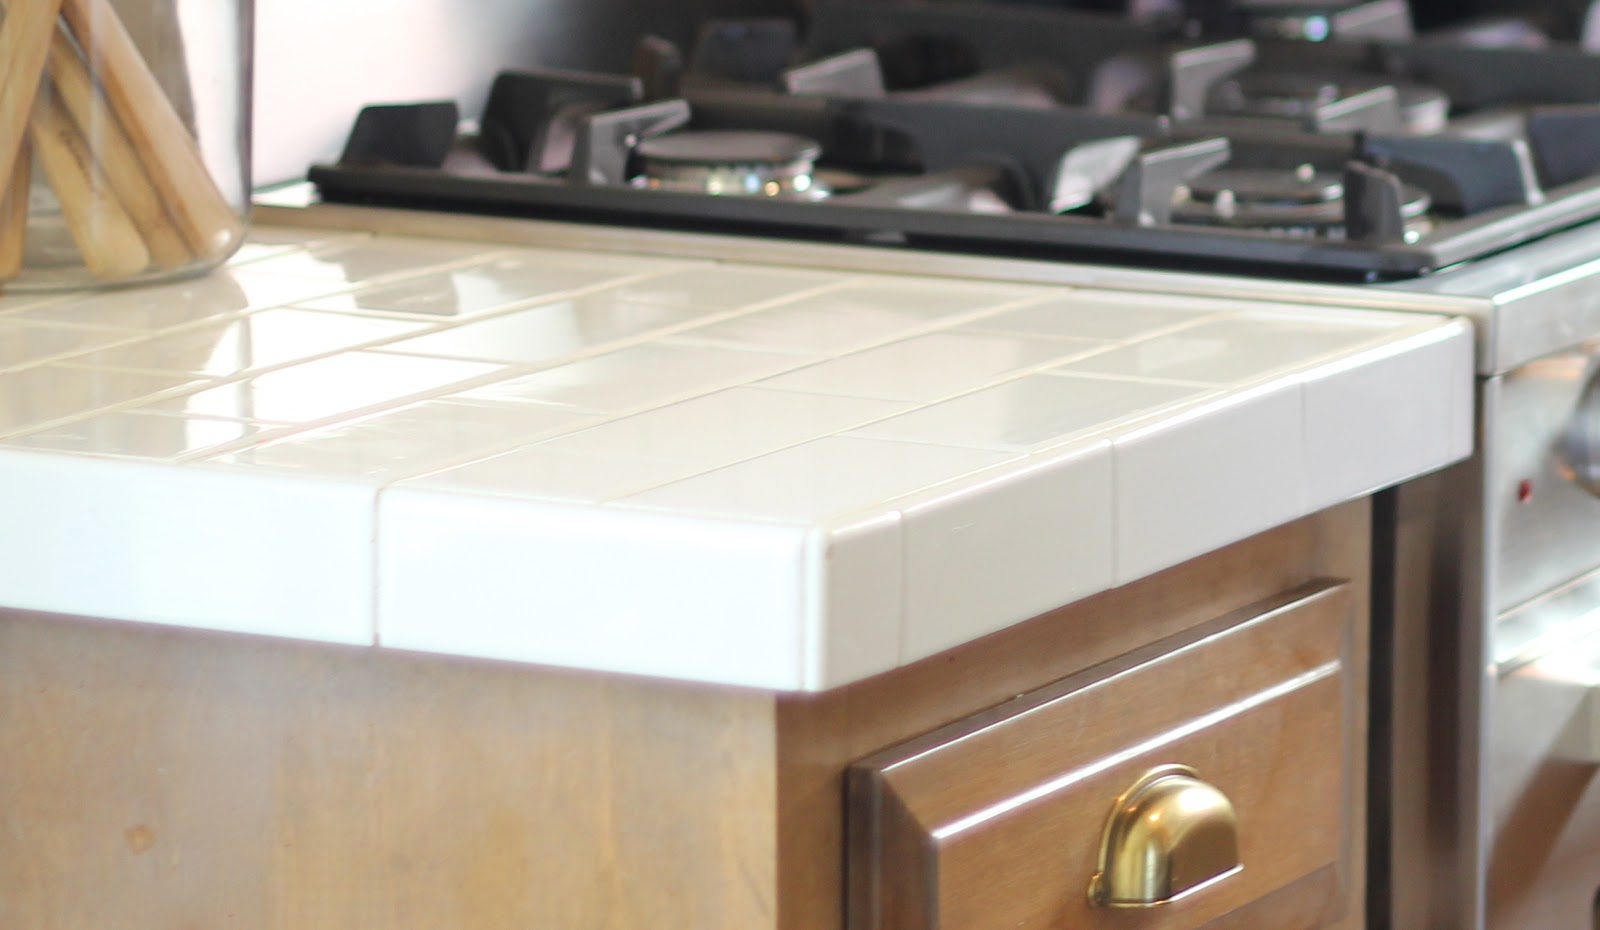 subway tile countertop tile kitchen countertops Jenny Steffens Hobick Diy Kitchen Remodel 40 Subway Tile Subway Tile Countertops